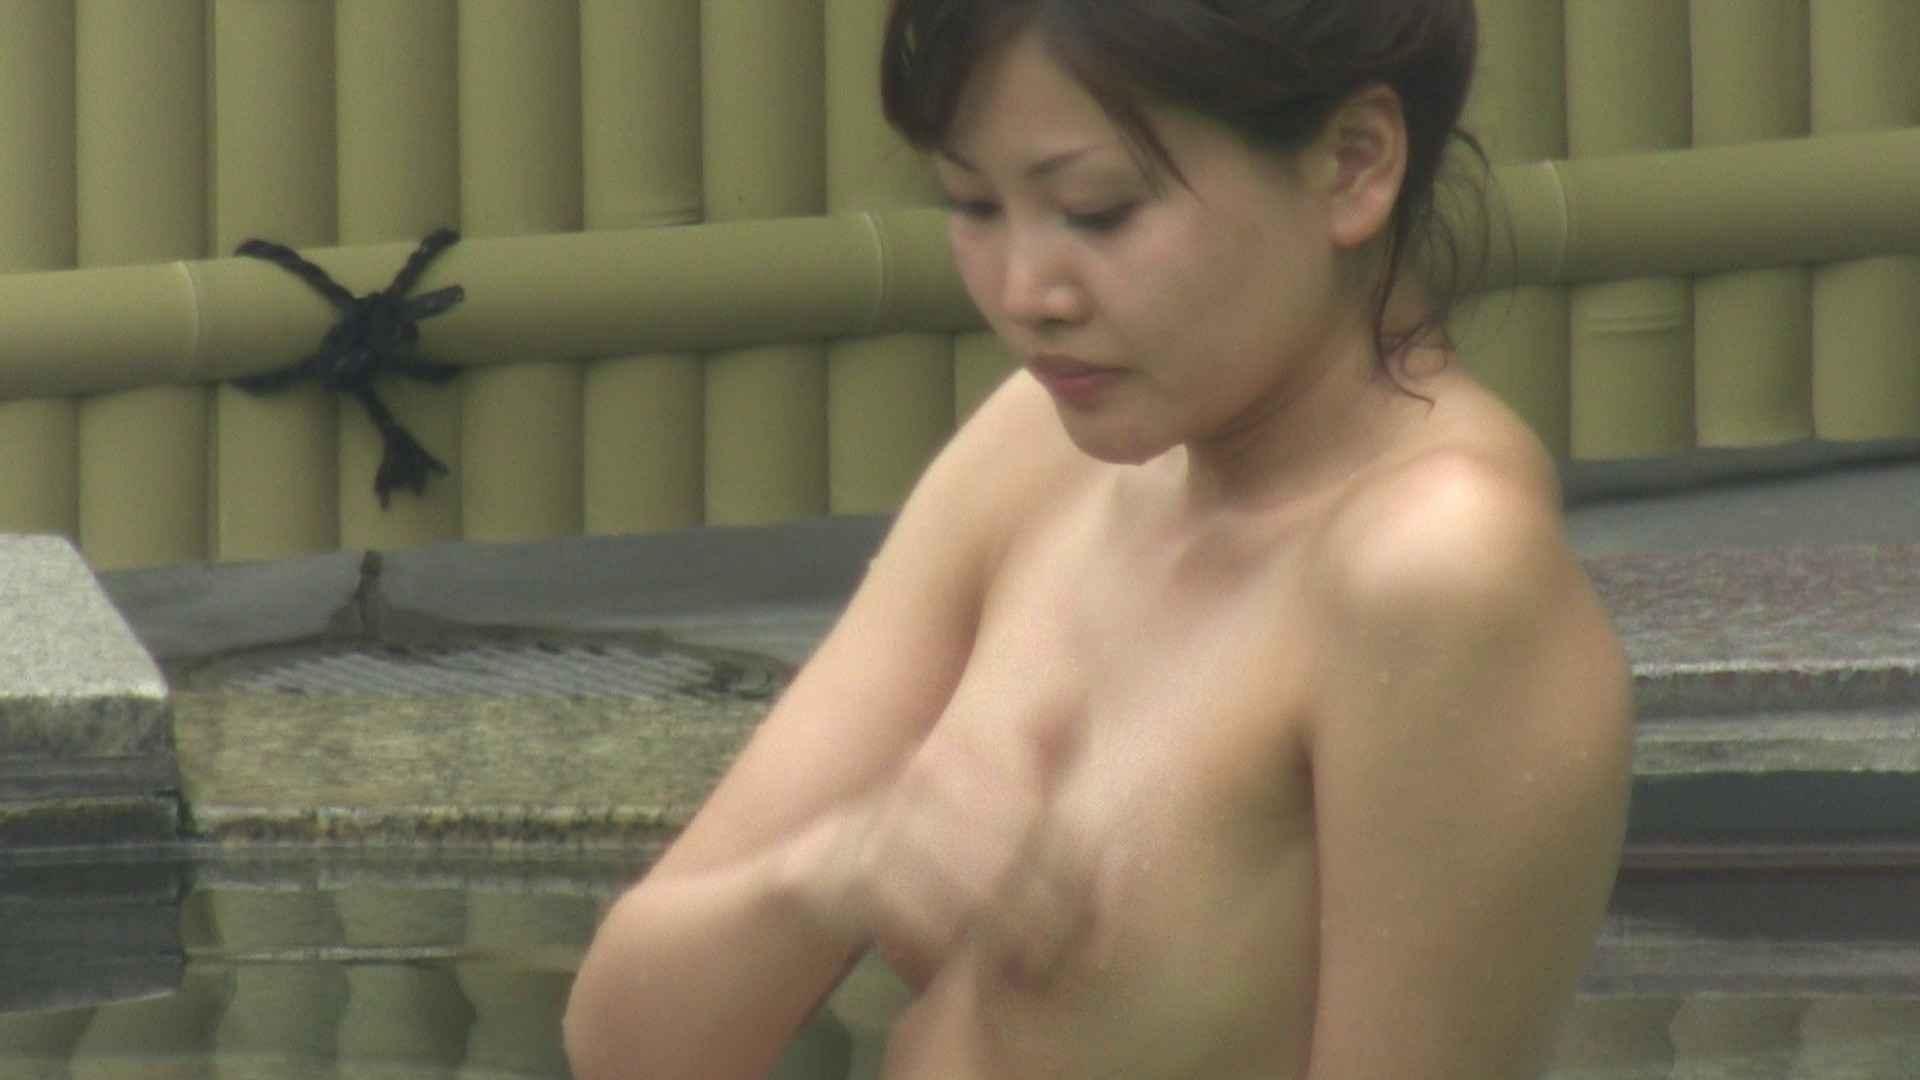 Aquaな露天風呂Vol.125 0  26連発 22